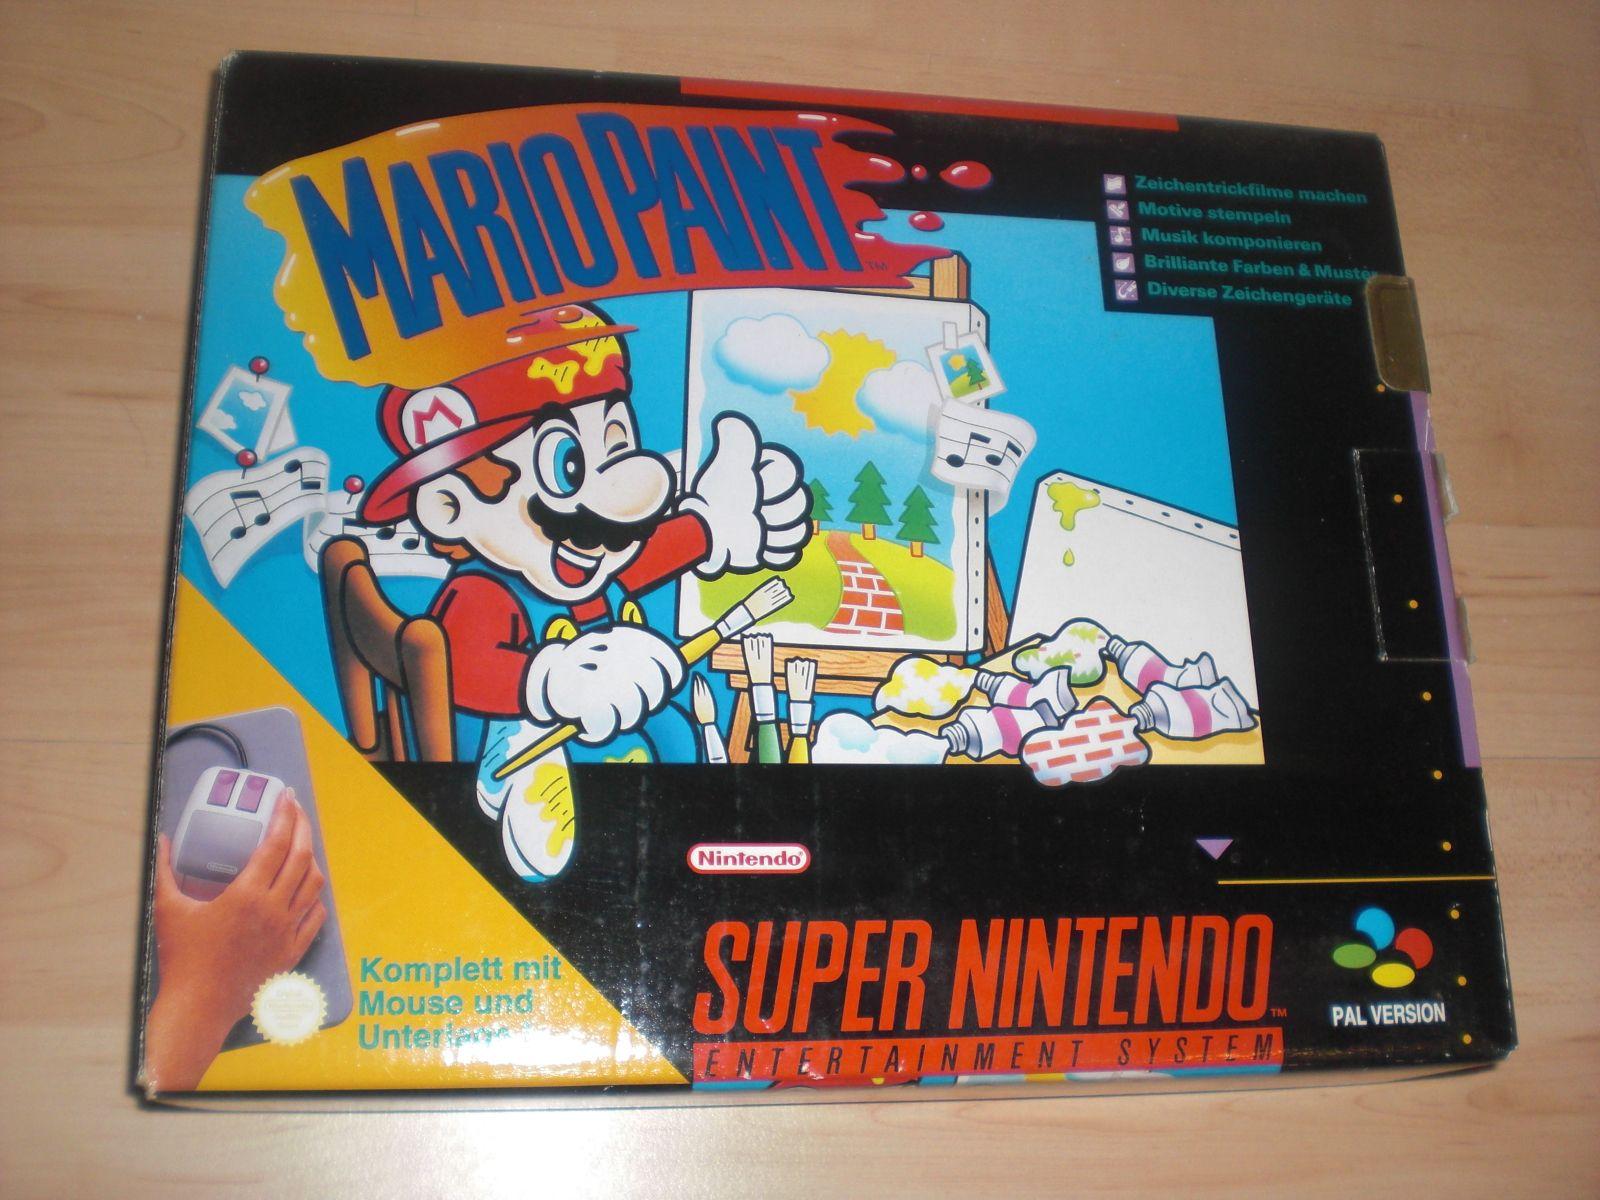 Mario Paint Boxed Cib Super Nintendo Game Snes With Mouse And Pad Super Nintendo Super Nintendo Games Paint Games